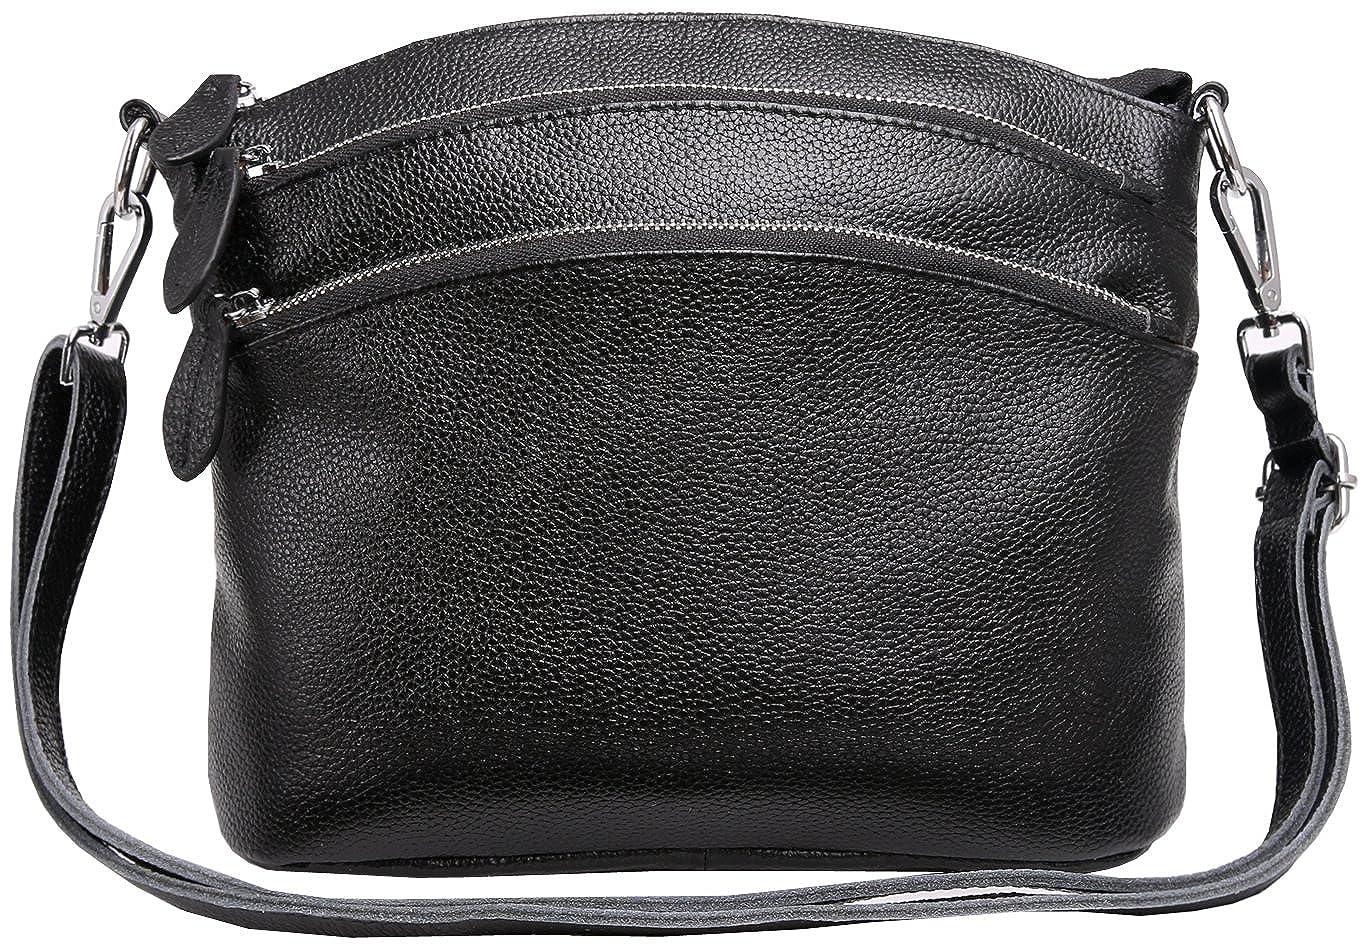 Buy Heshe Womens Soft Leather Handbags Shoulder Bag Multi Zipper Pocket Small Bags Designer Handbag Crossbody Purse Satchel And Purses For Ladies Black E At Amazon In,Modern Exhibition Stand Design